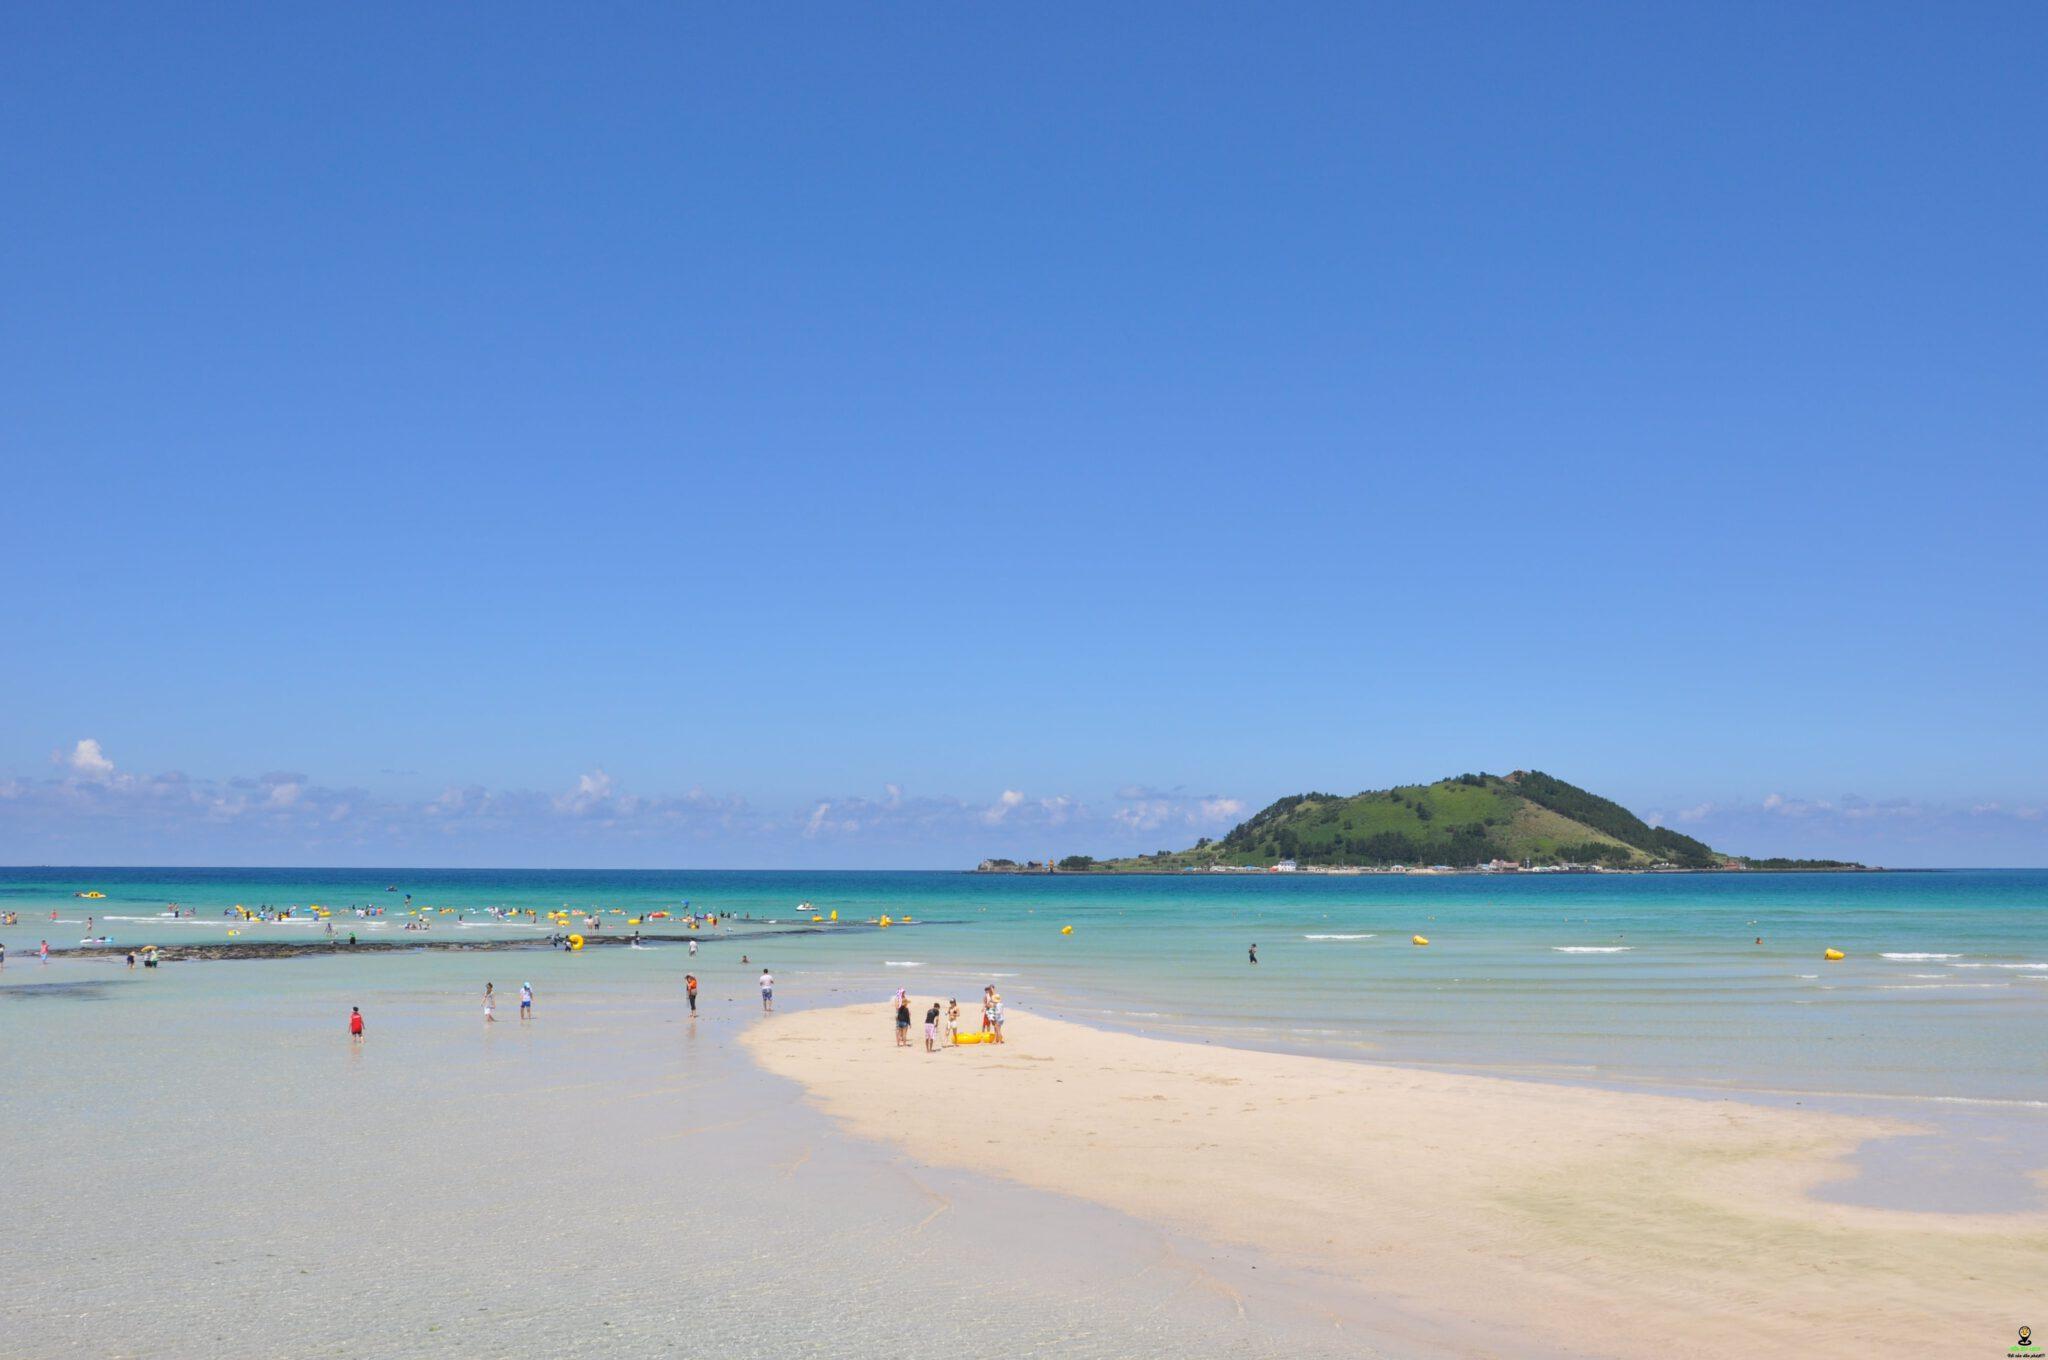 Bãi biển Muchangpo